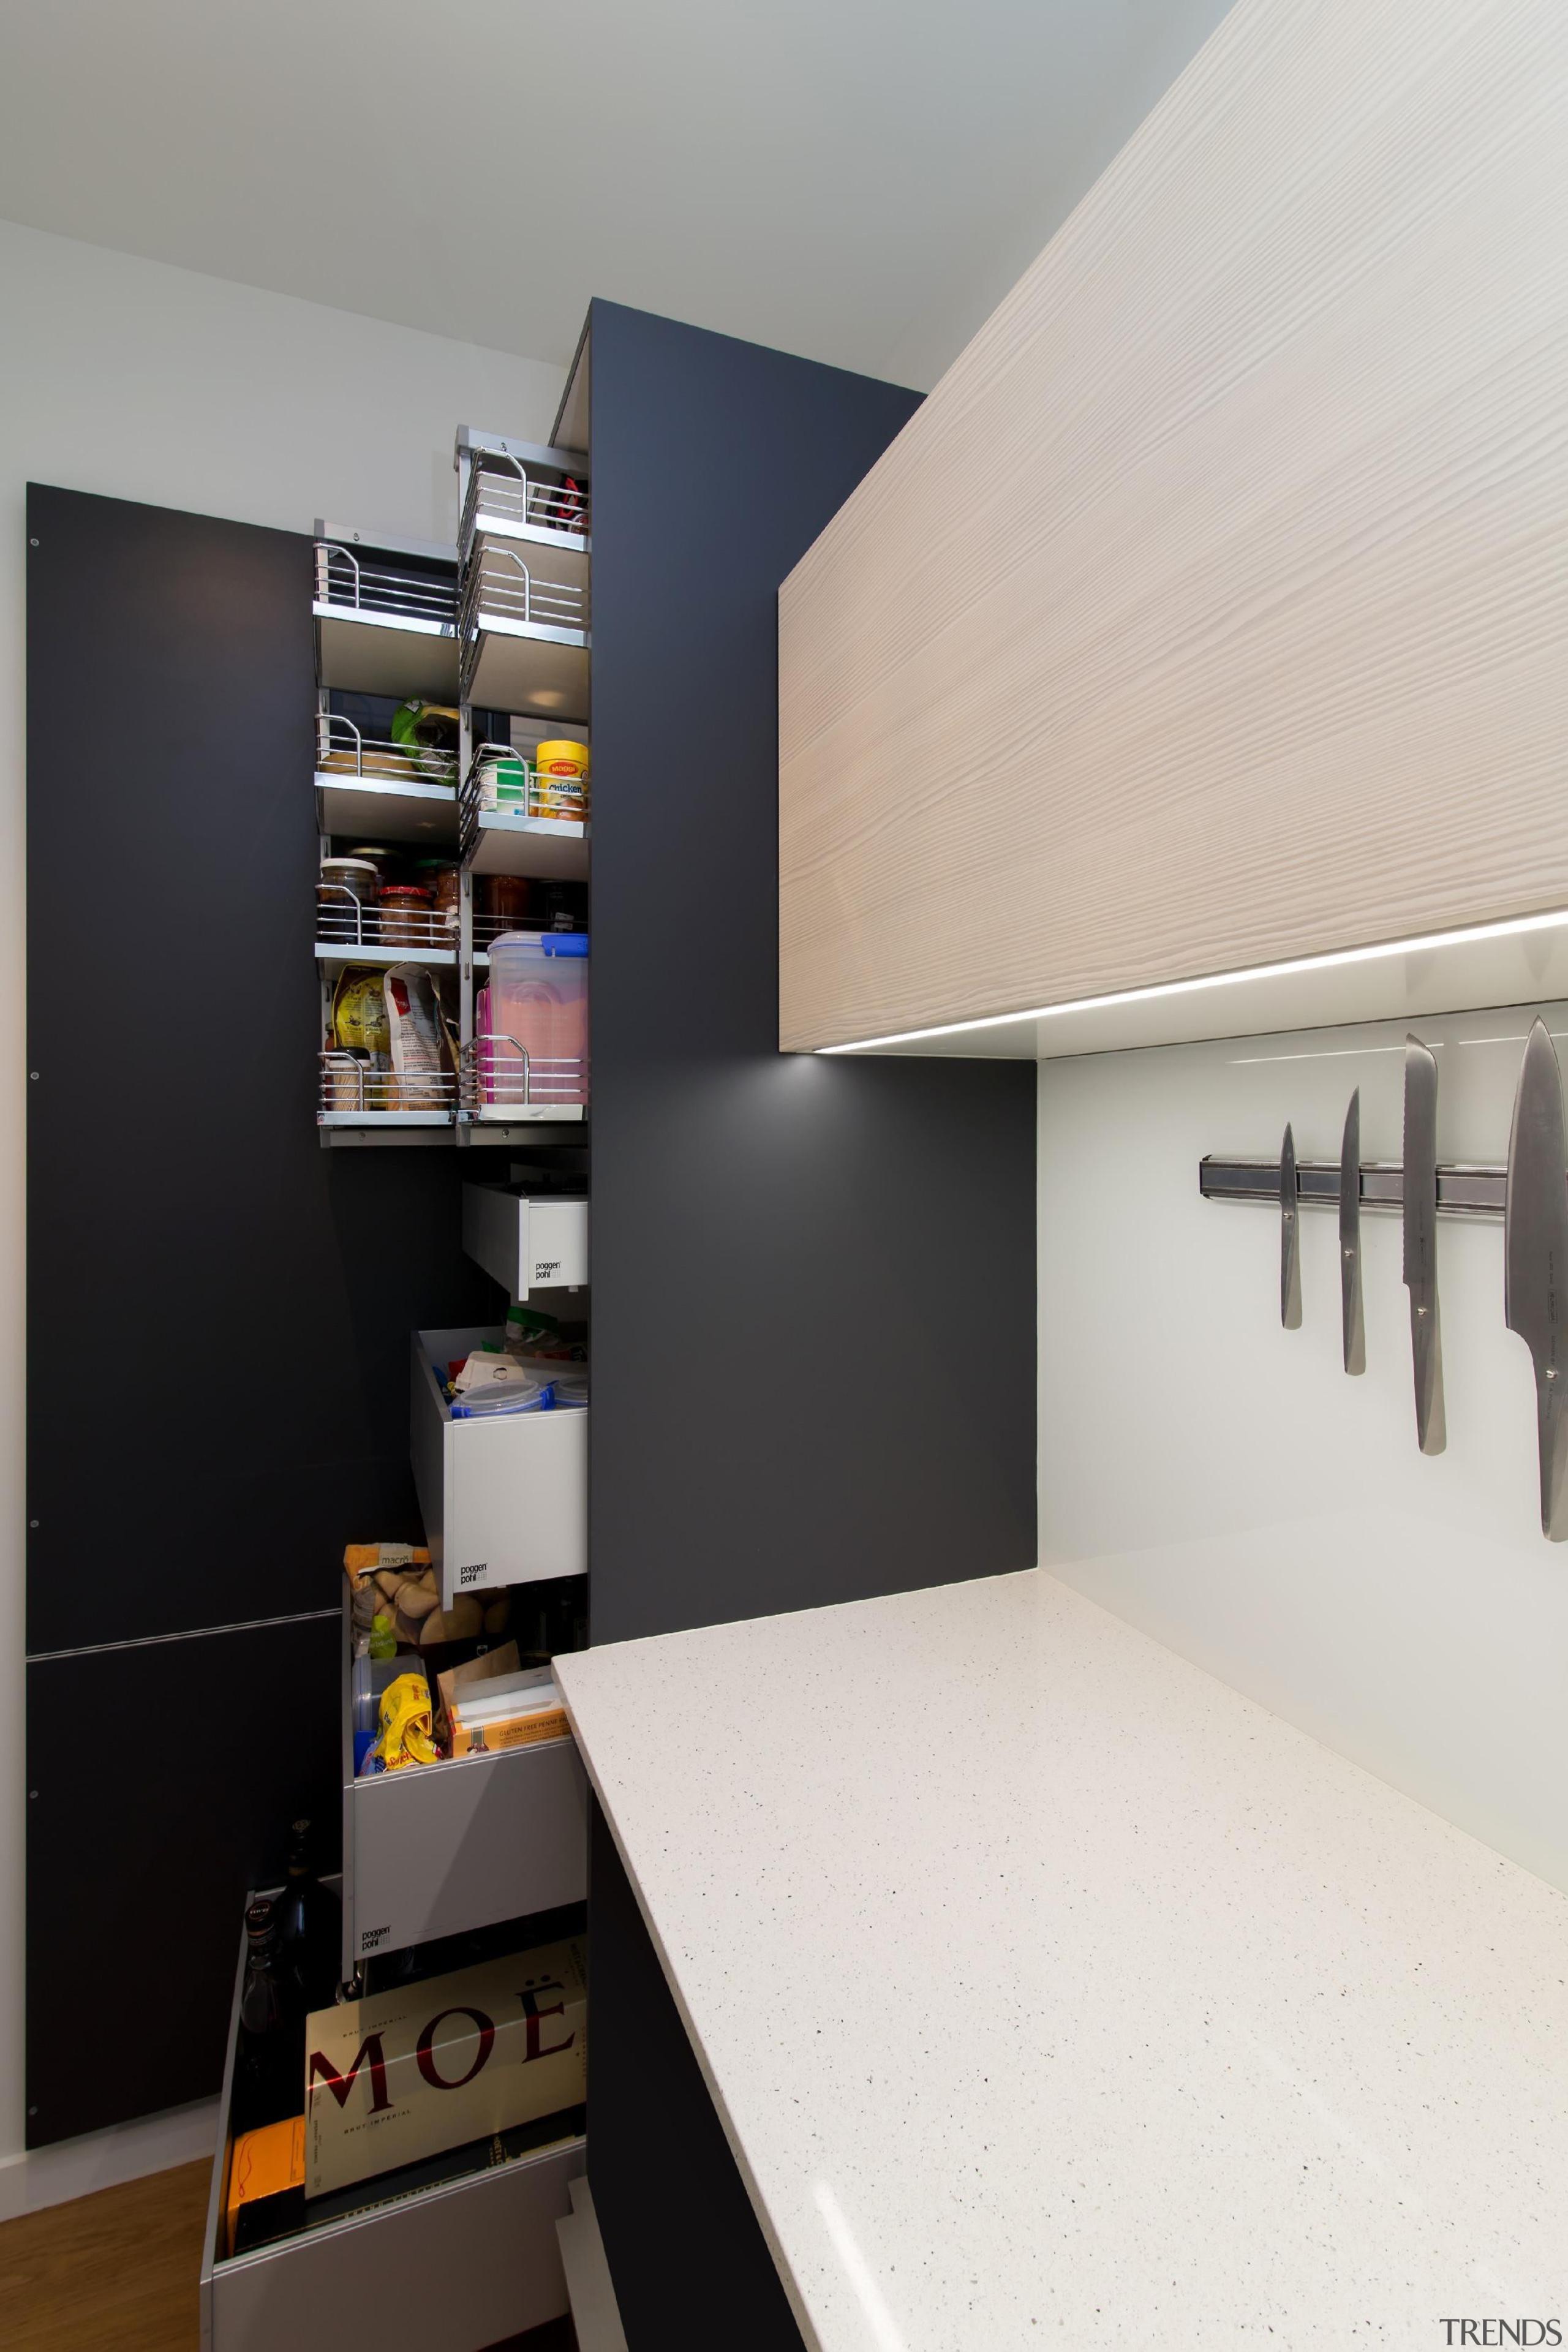 Full shot of the pantry in the sculleryFor furniture, interior design, product design, room, shelf, shelving, white, black